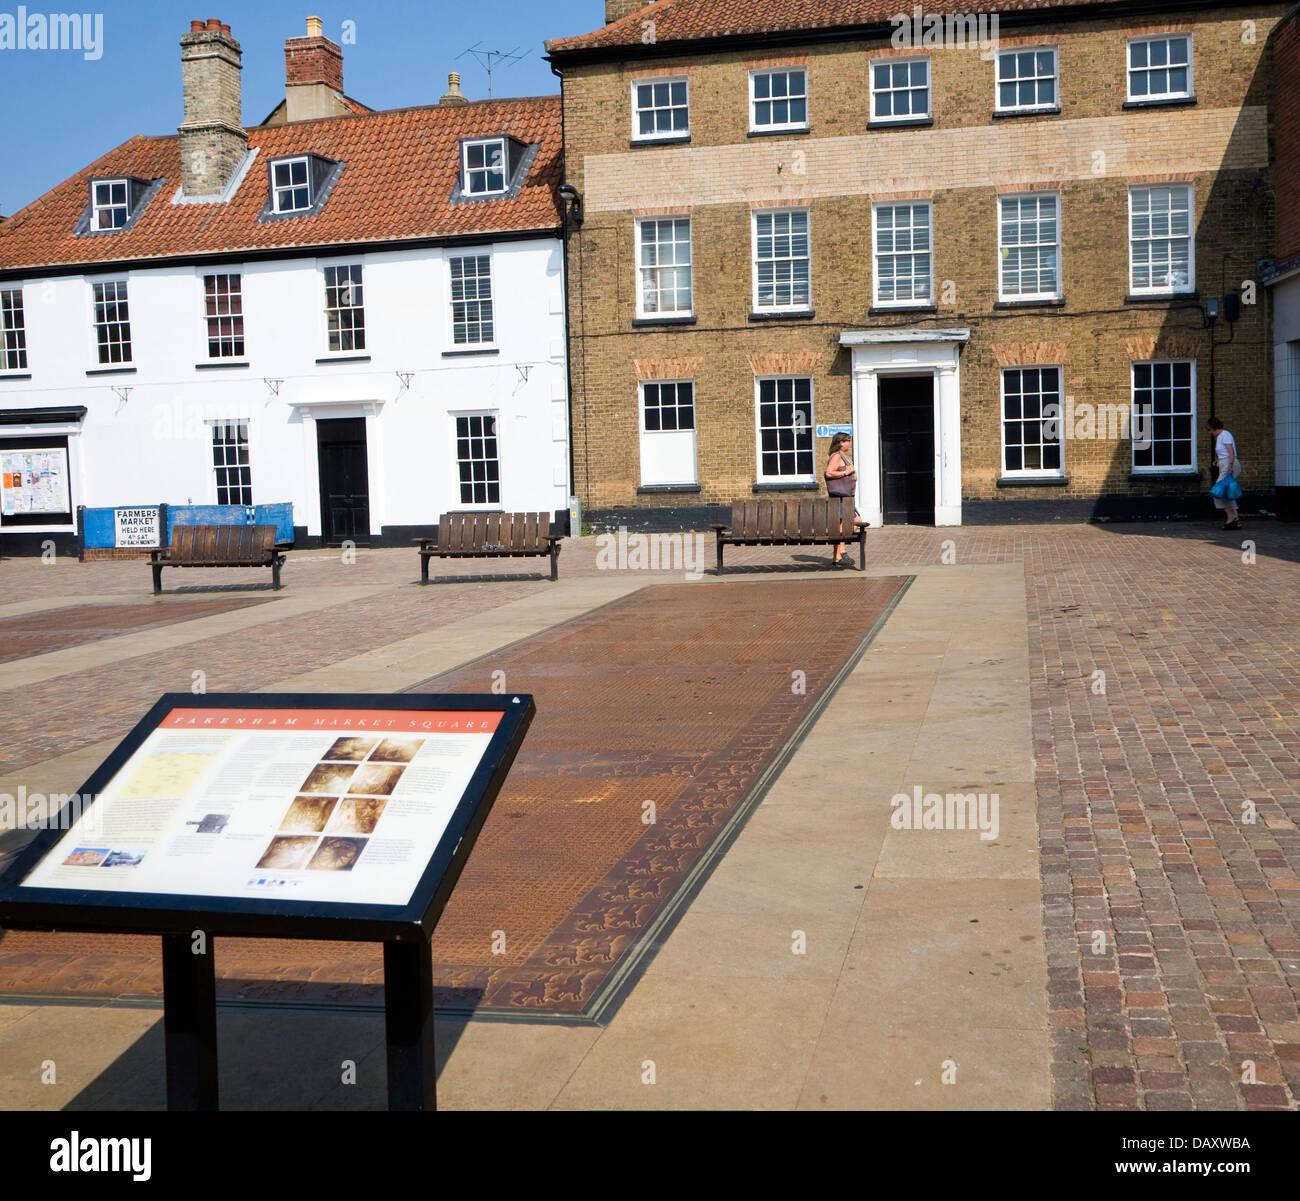 Typeface font display Market Place Fakenham Norfolk England marking the town's historic publishing connection. - Stock Image